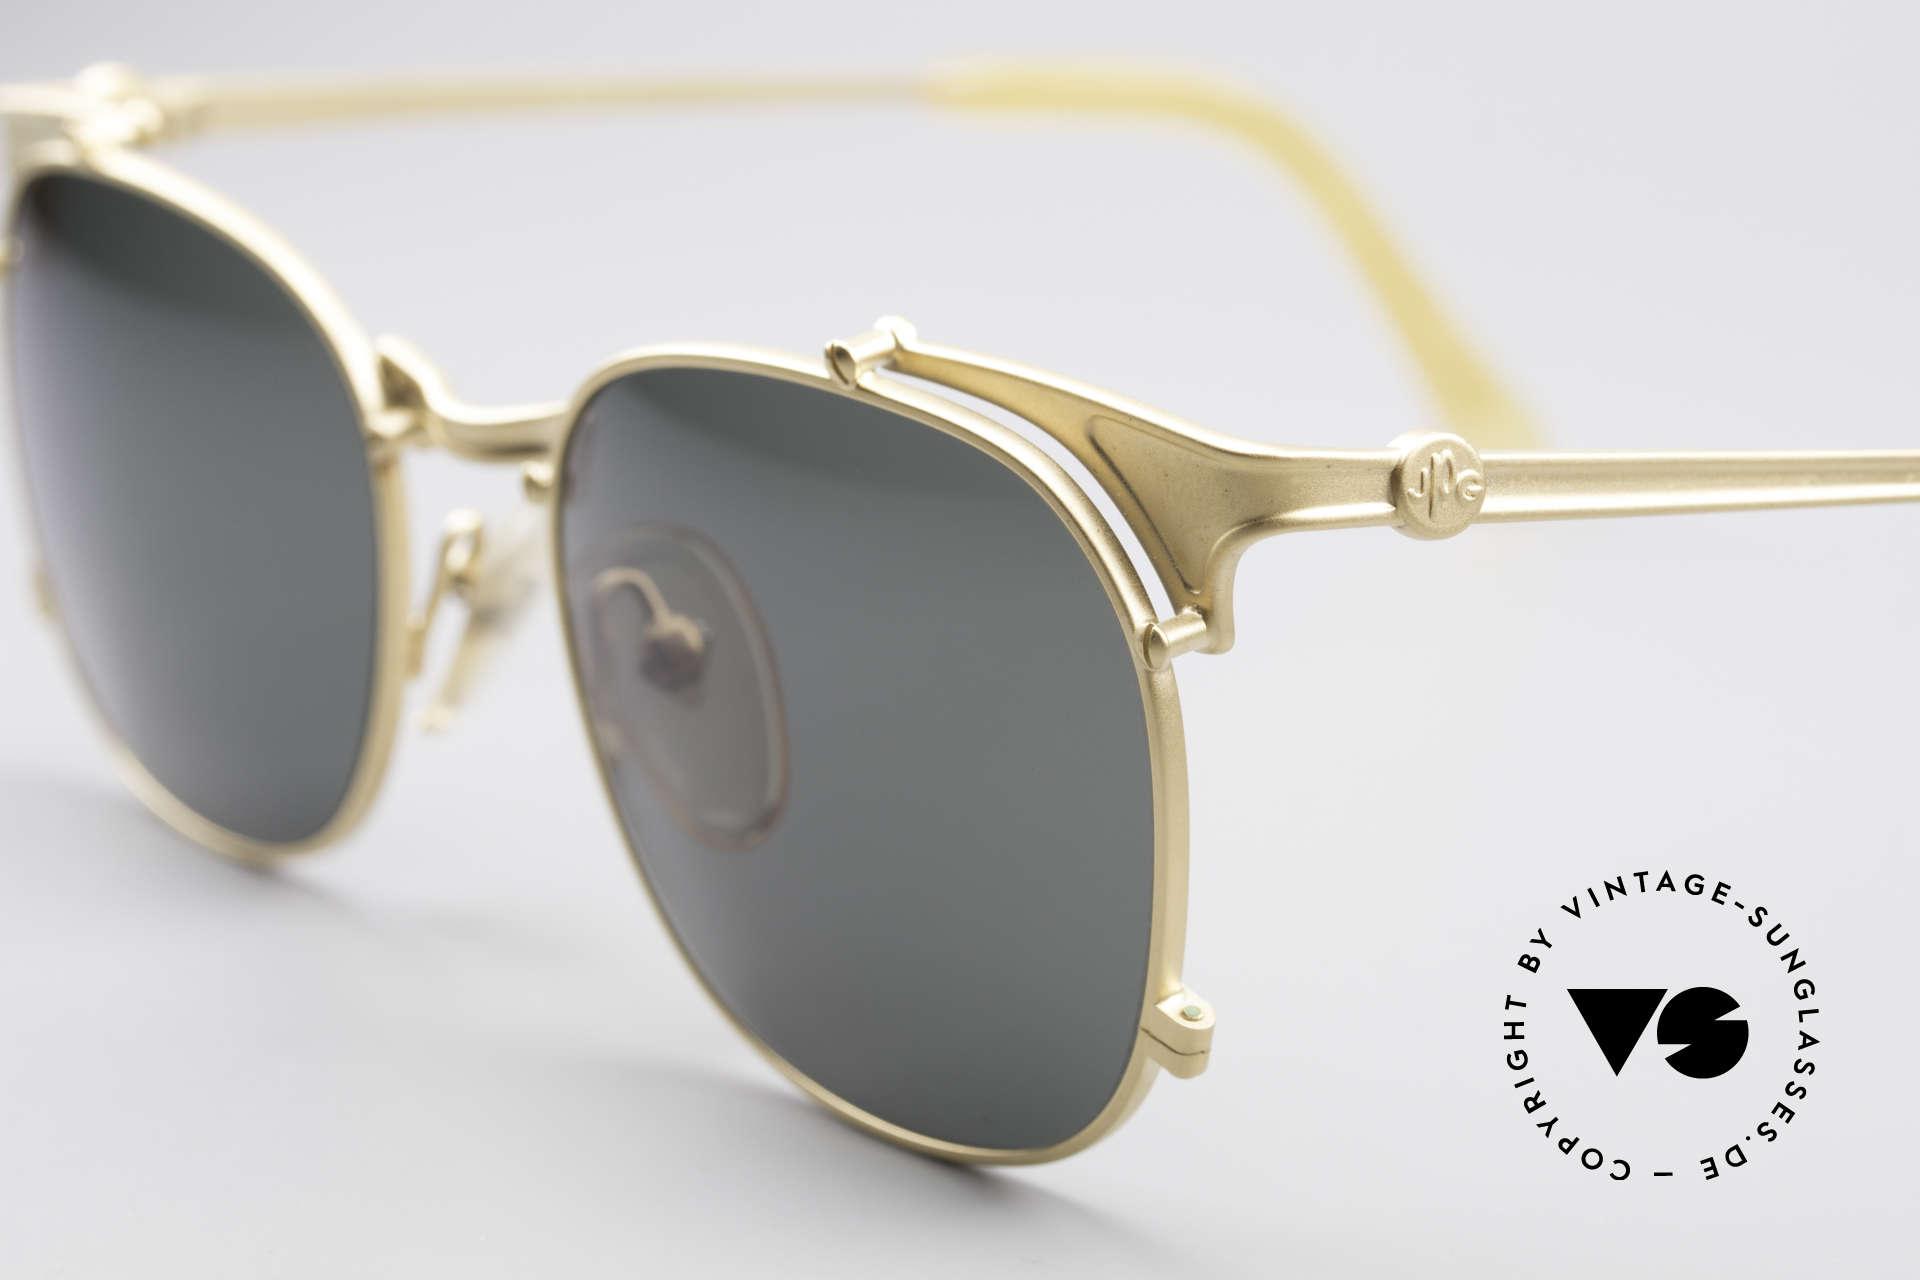 sunglasses jean paul gaultier 56 2175 rare vintage. Black Bedroom Furniture Sets. Home Design Ideas